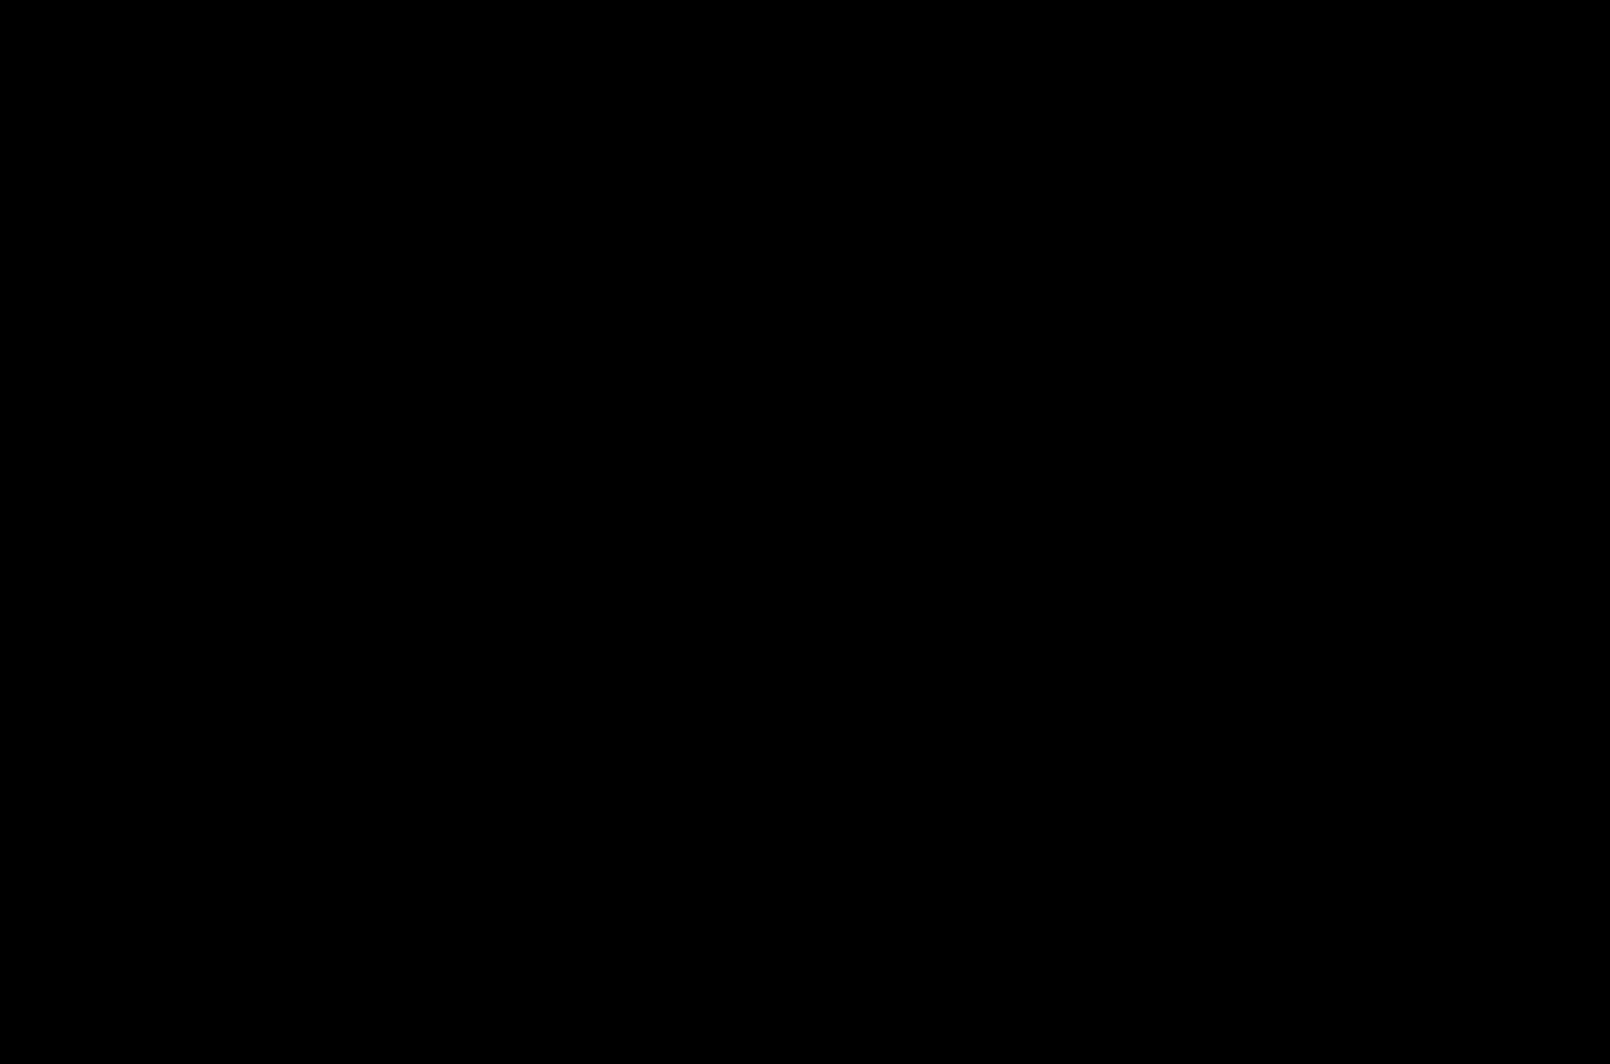 Amino-dPEG®₁₂-Tris(-dPEG®₂₄-t-butyl ester)₃